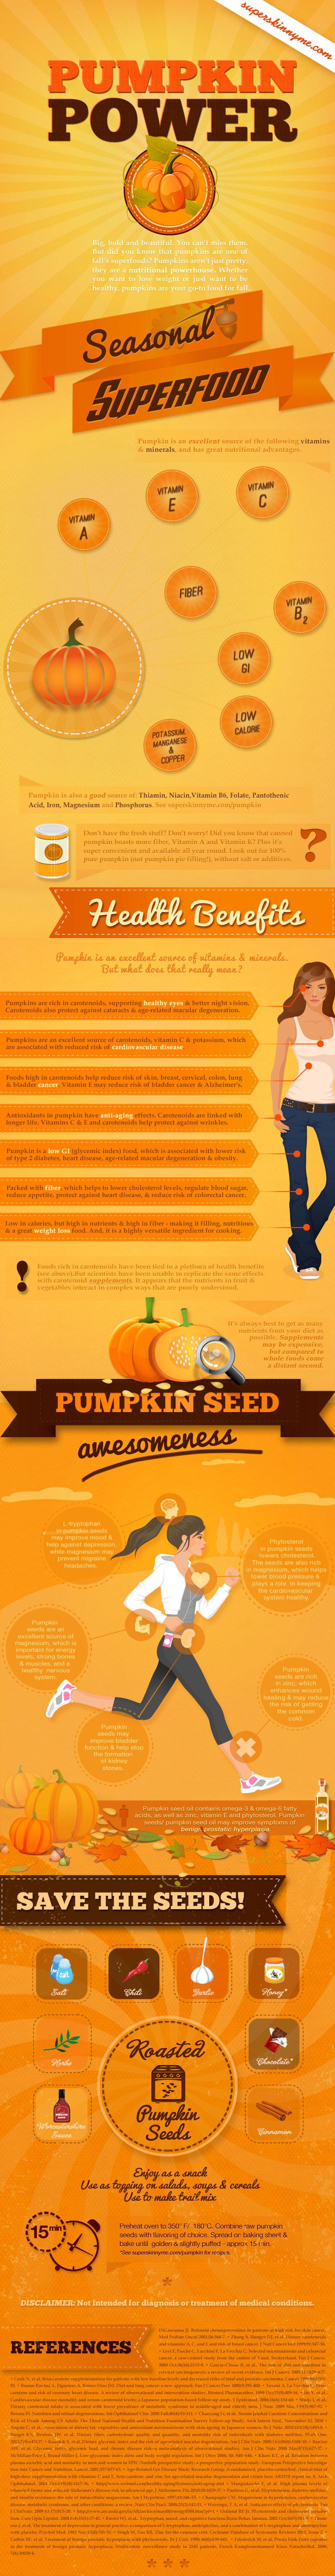 12 Pumpkin Benefits Infographic